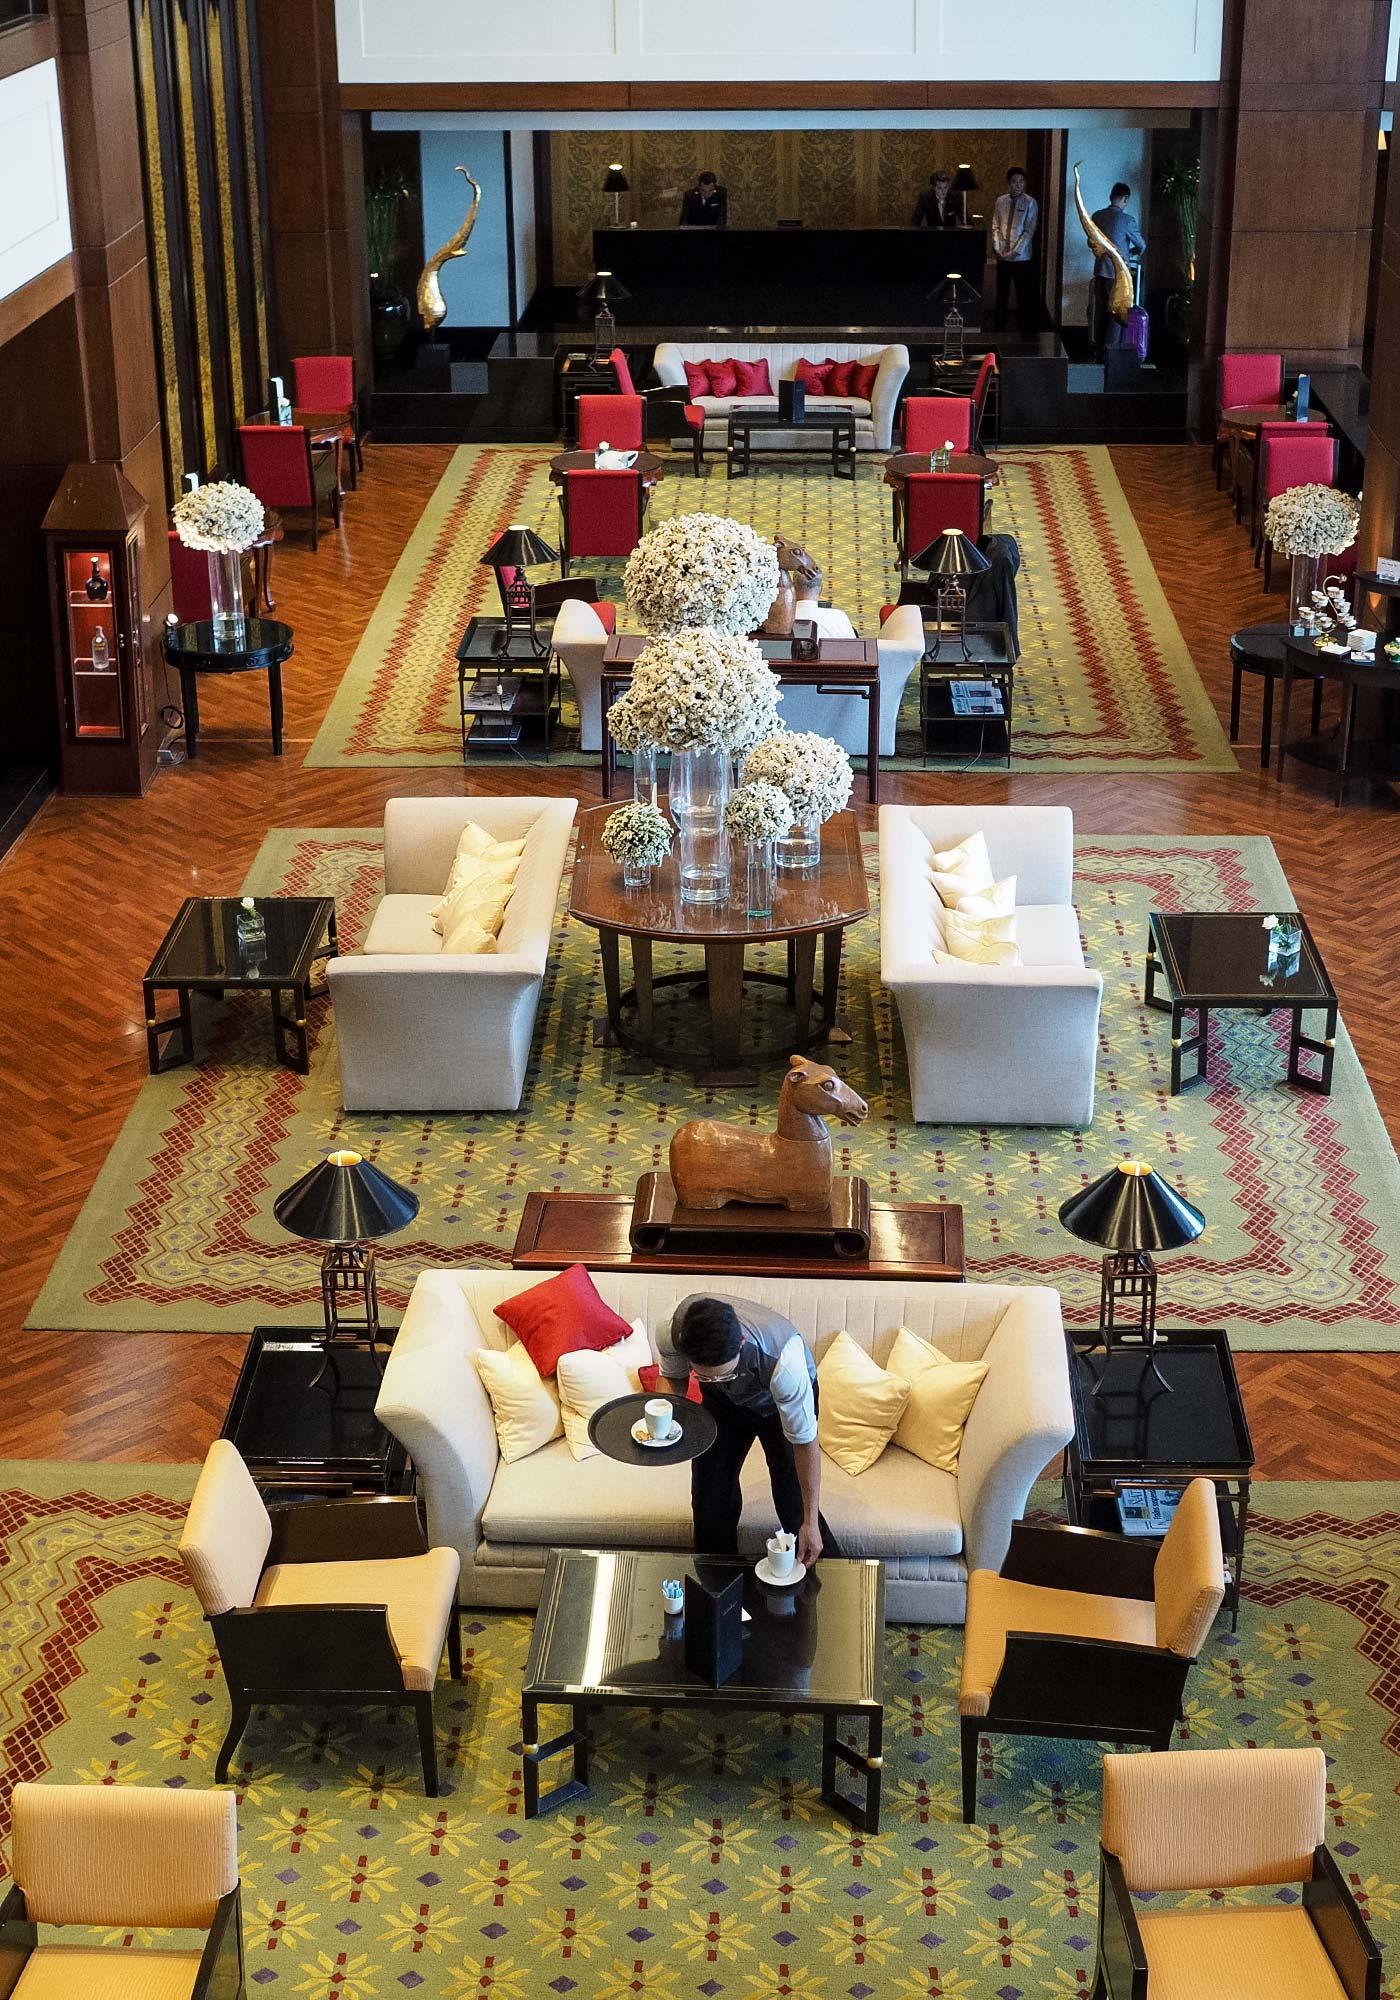 jw_marriott-bangkok-foyer